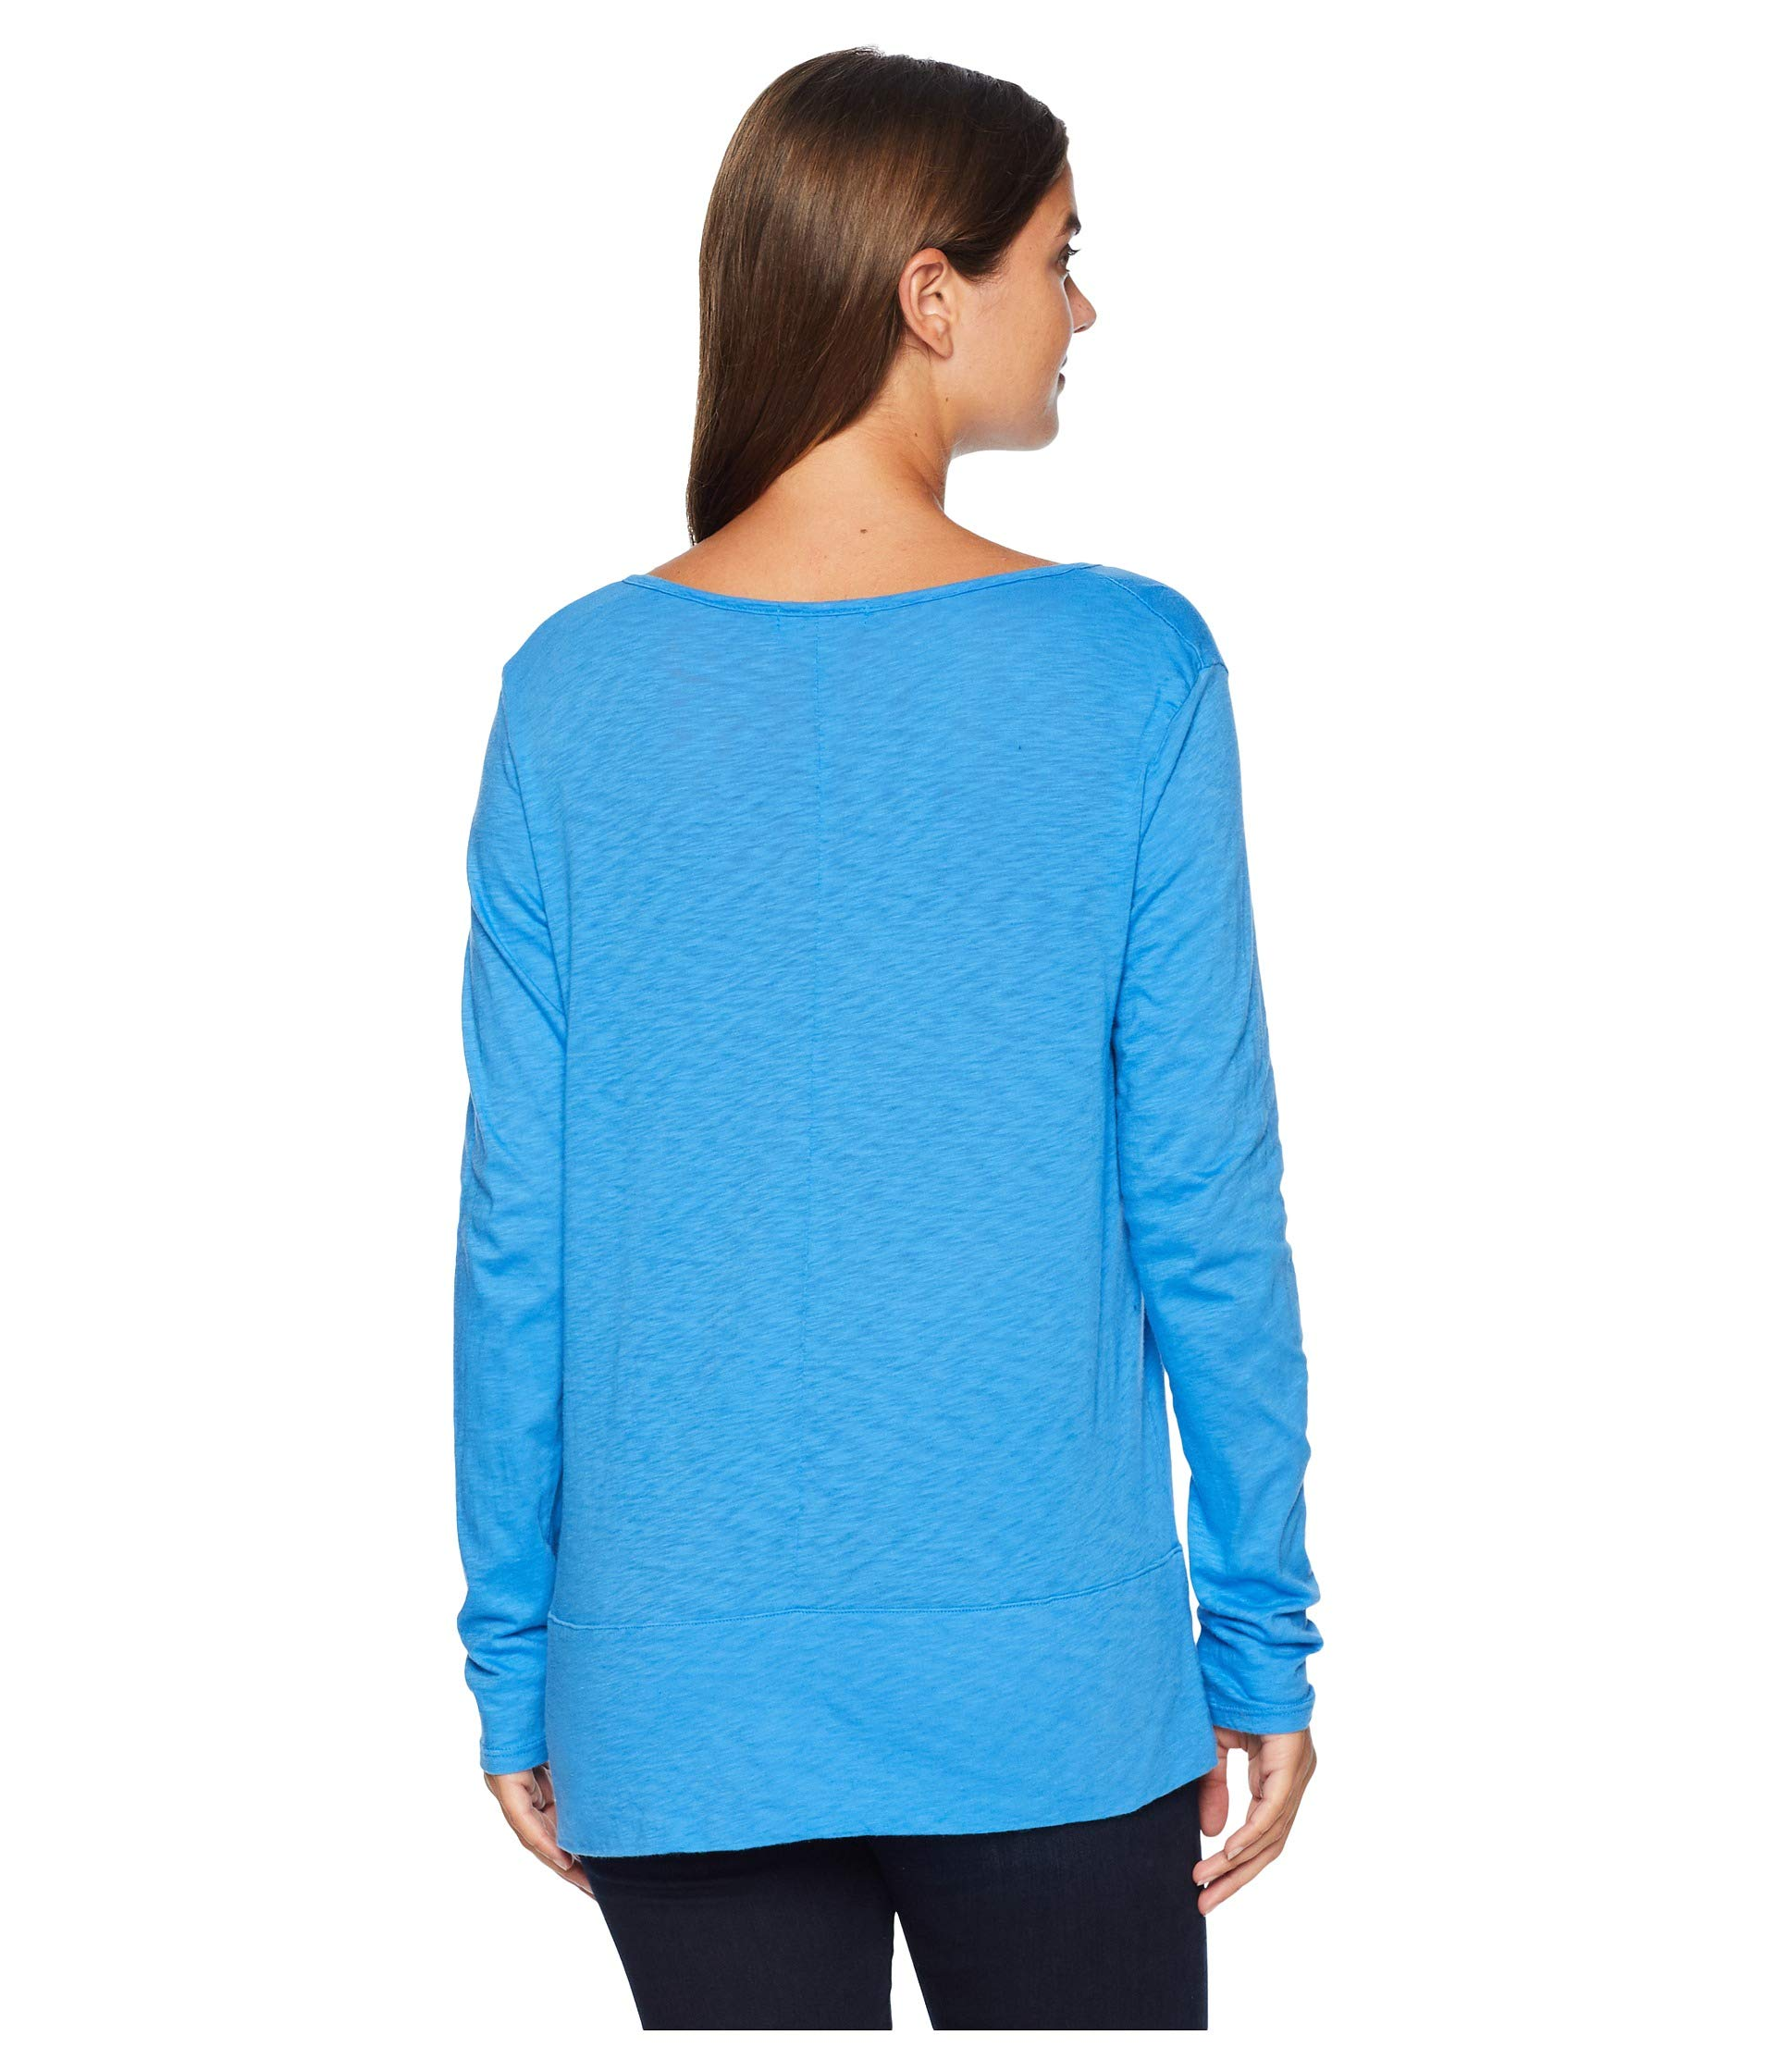 Tee neck Produce Atlantic Blue Sleeve Vintage Long Fresh Split tYHqRww